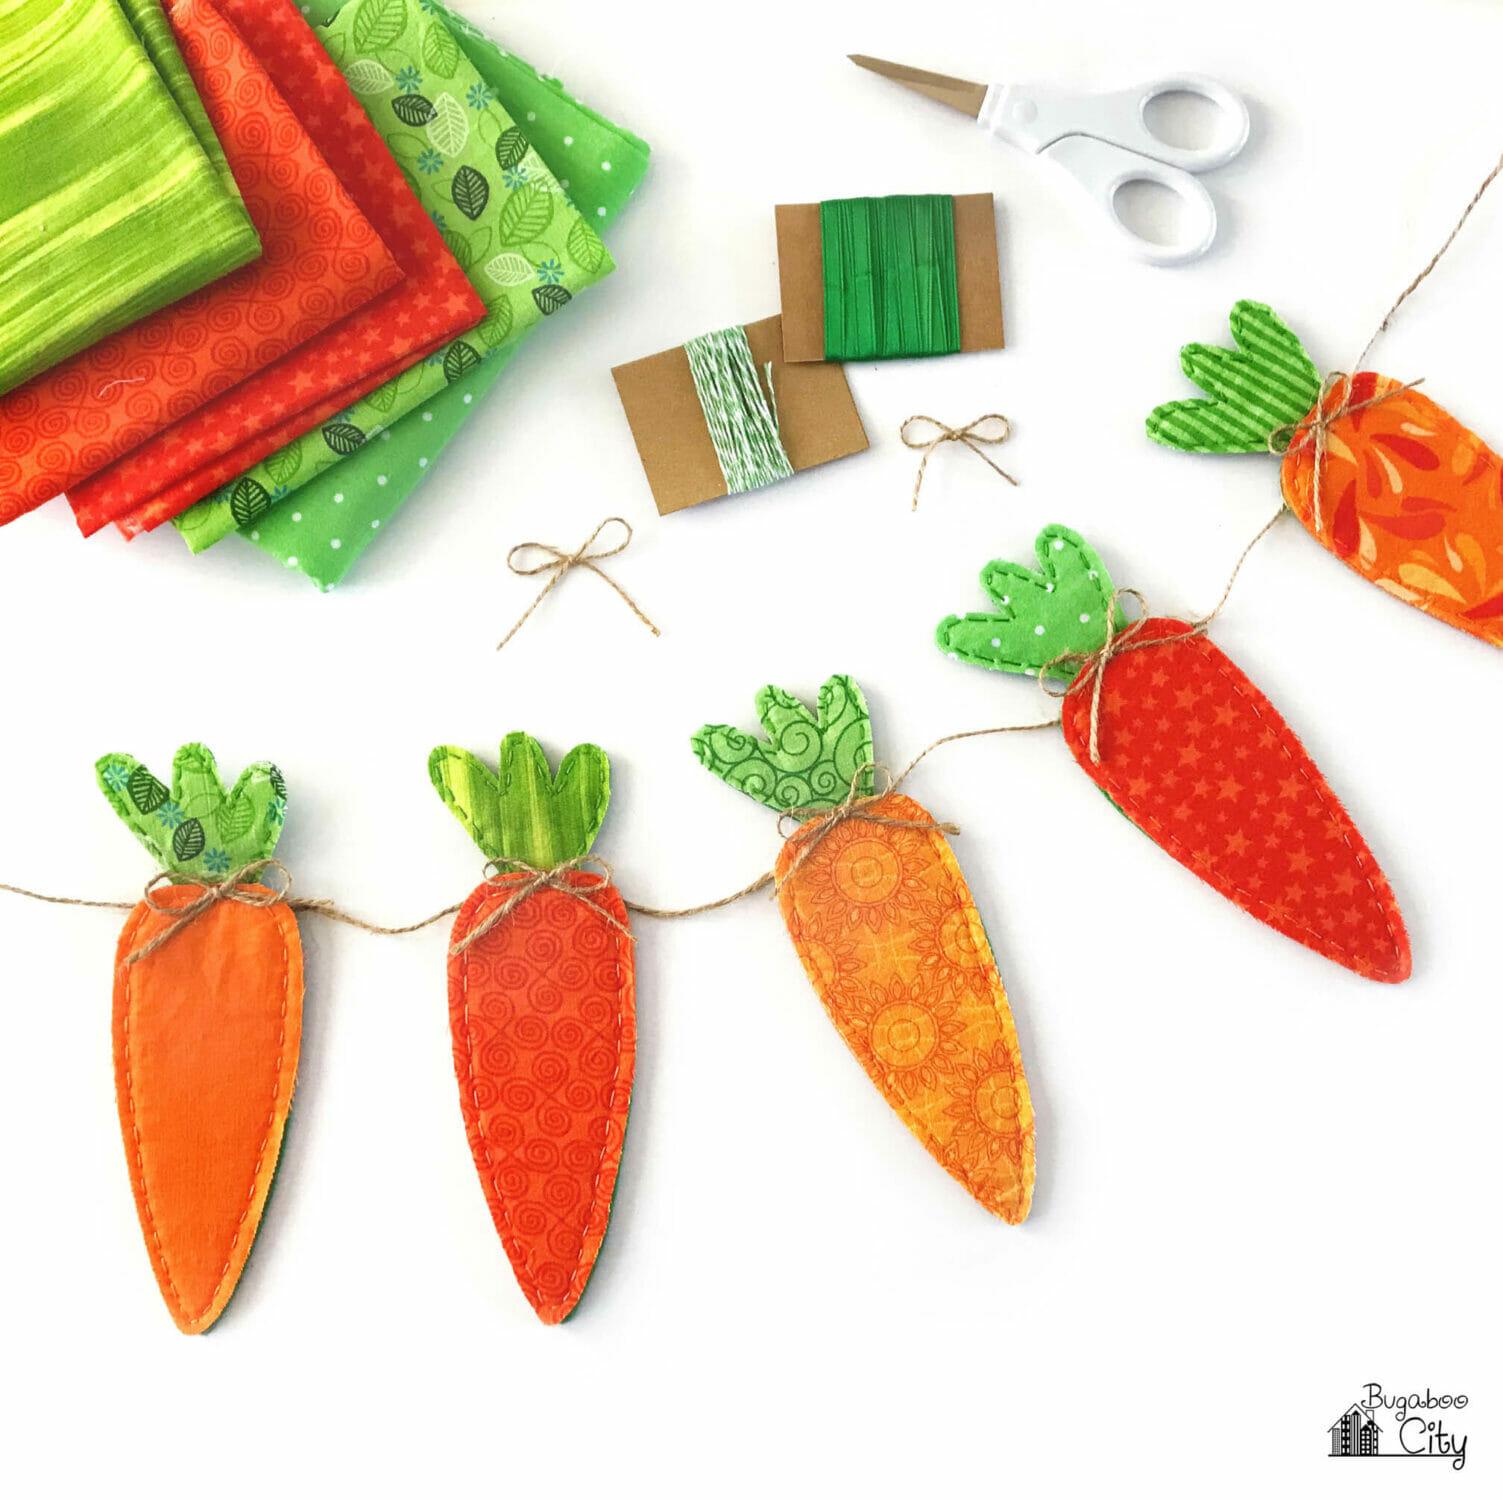 DIY Fabric Carrot Banner for Easter